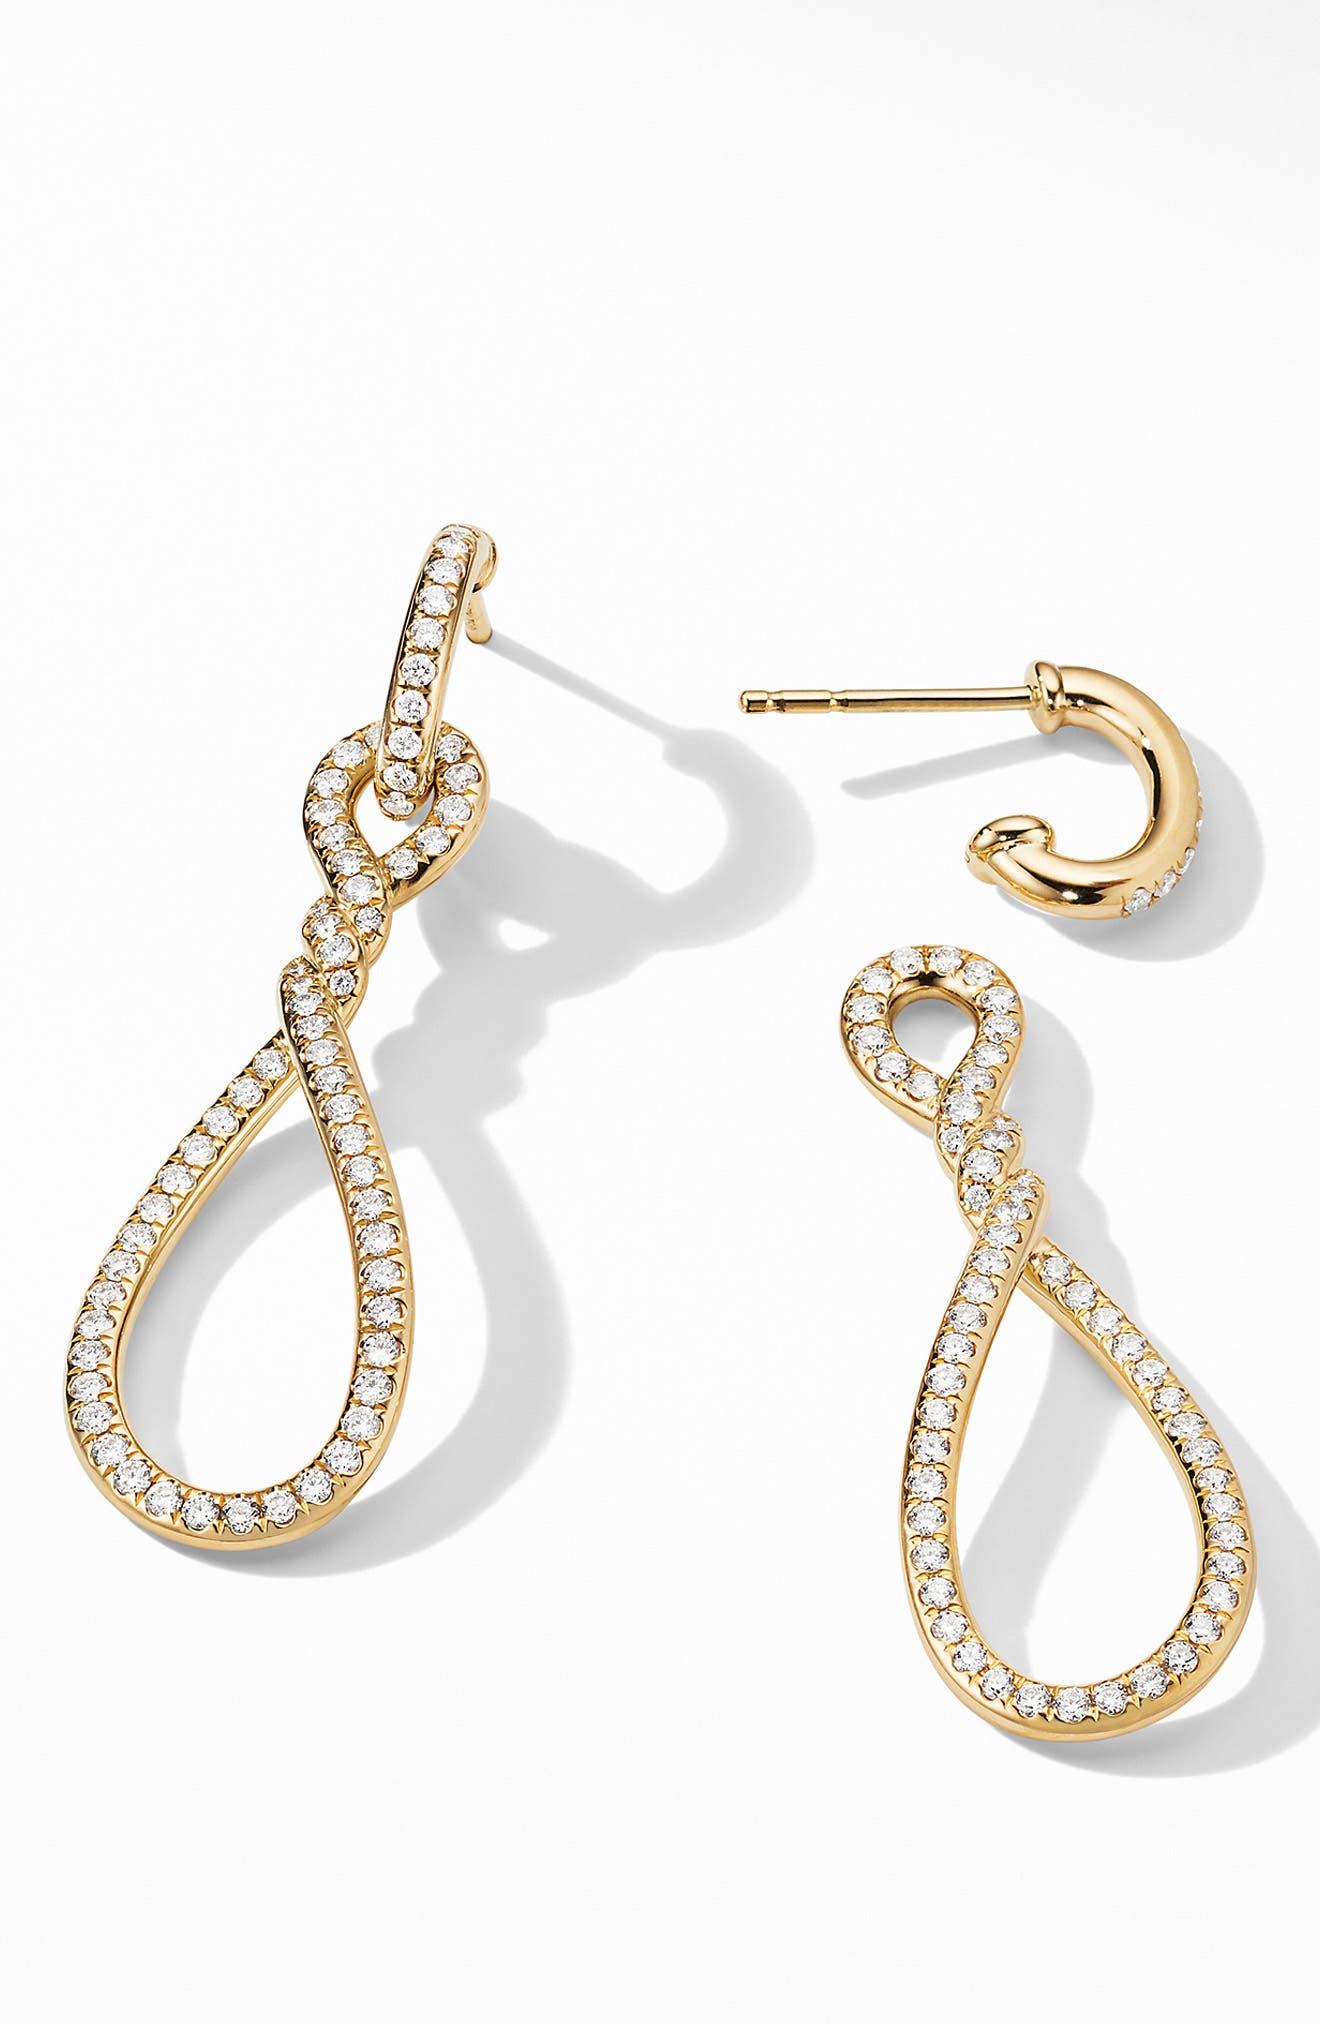 DAVID YURMAN,                             Continuance Full Pavé Small Drop Earrings in 18K Yellow Gold,                             Alternate thumbnail 2, color,                             YELLOW GOLD/ DIAMOND